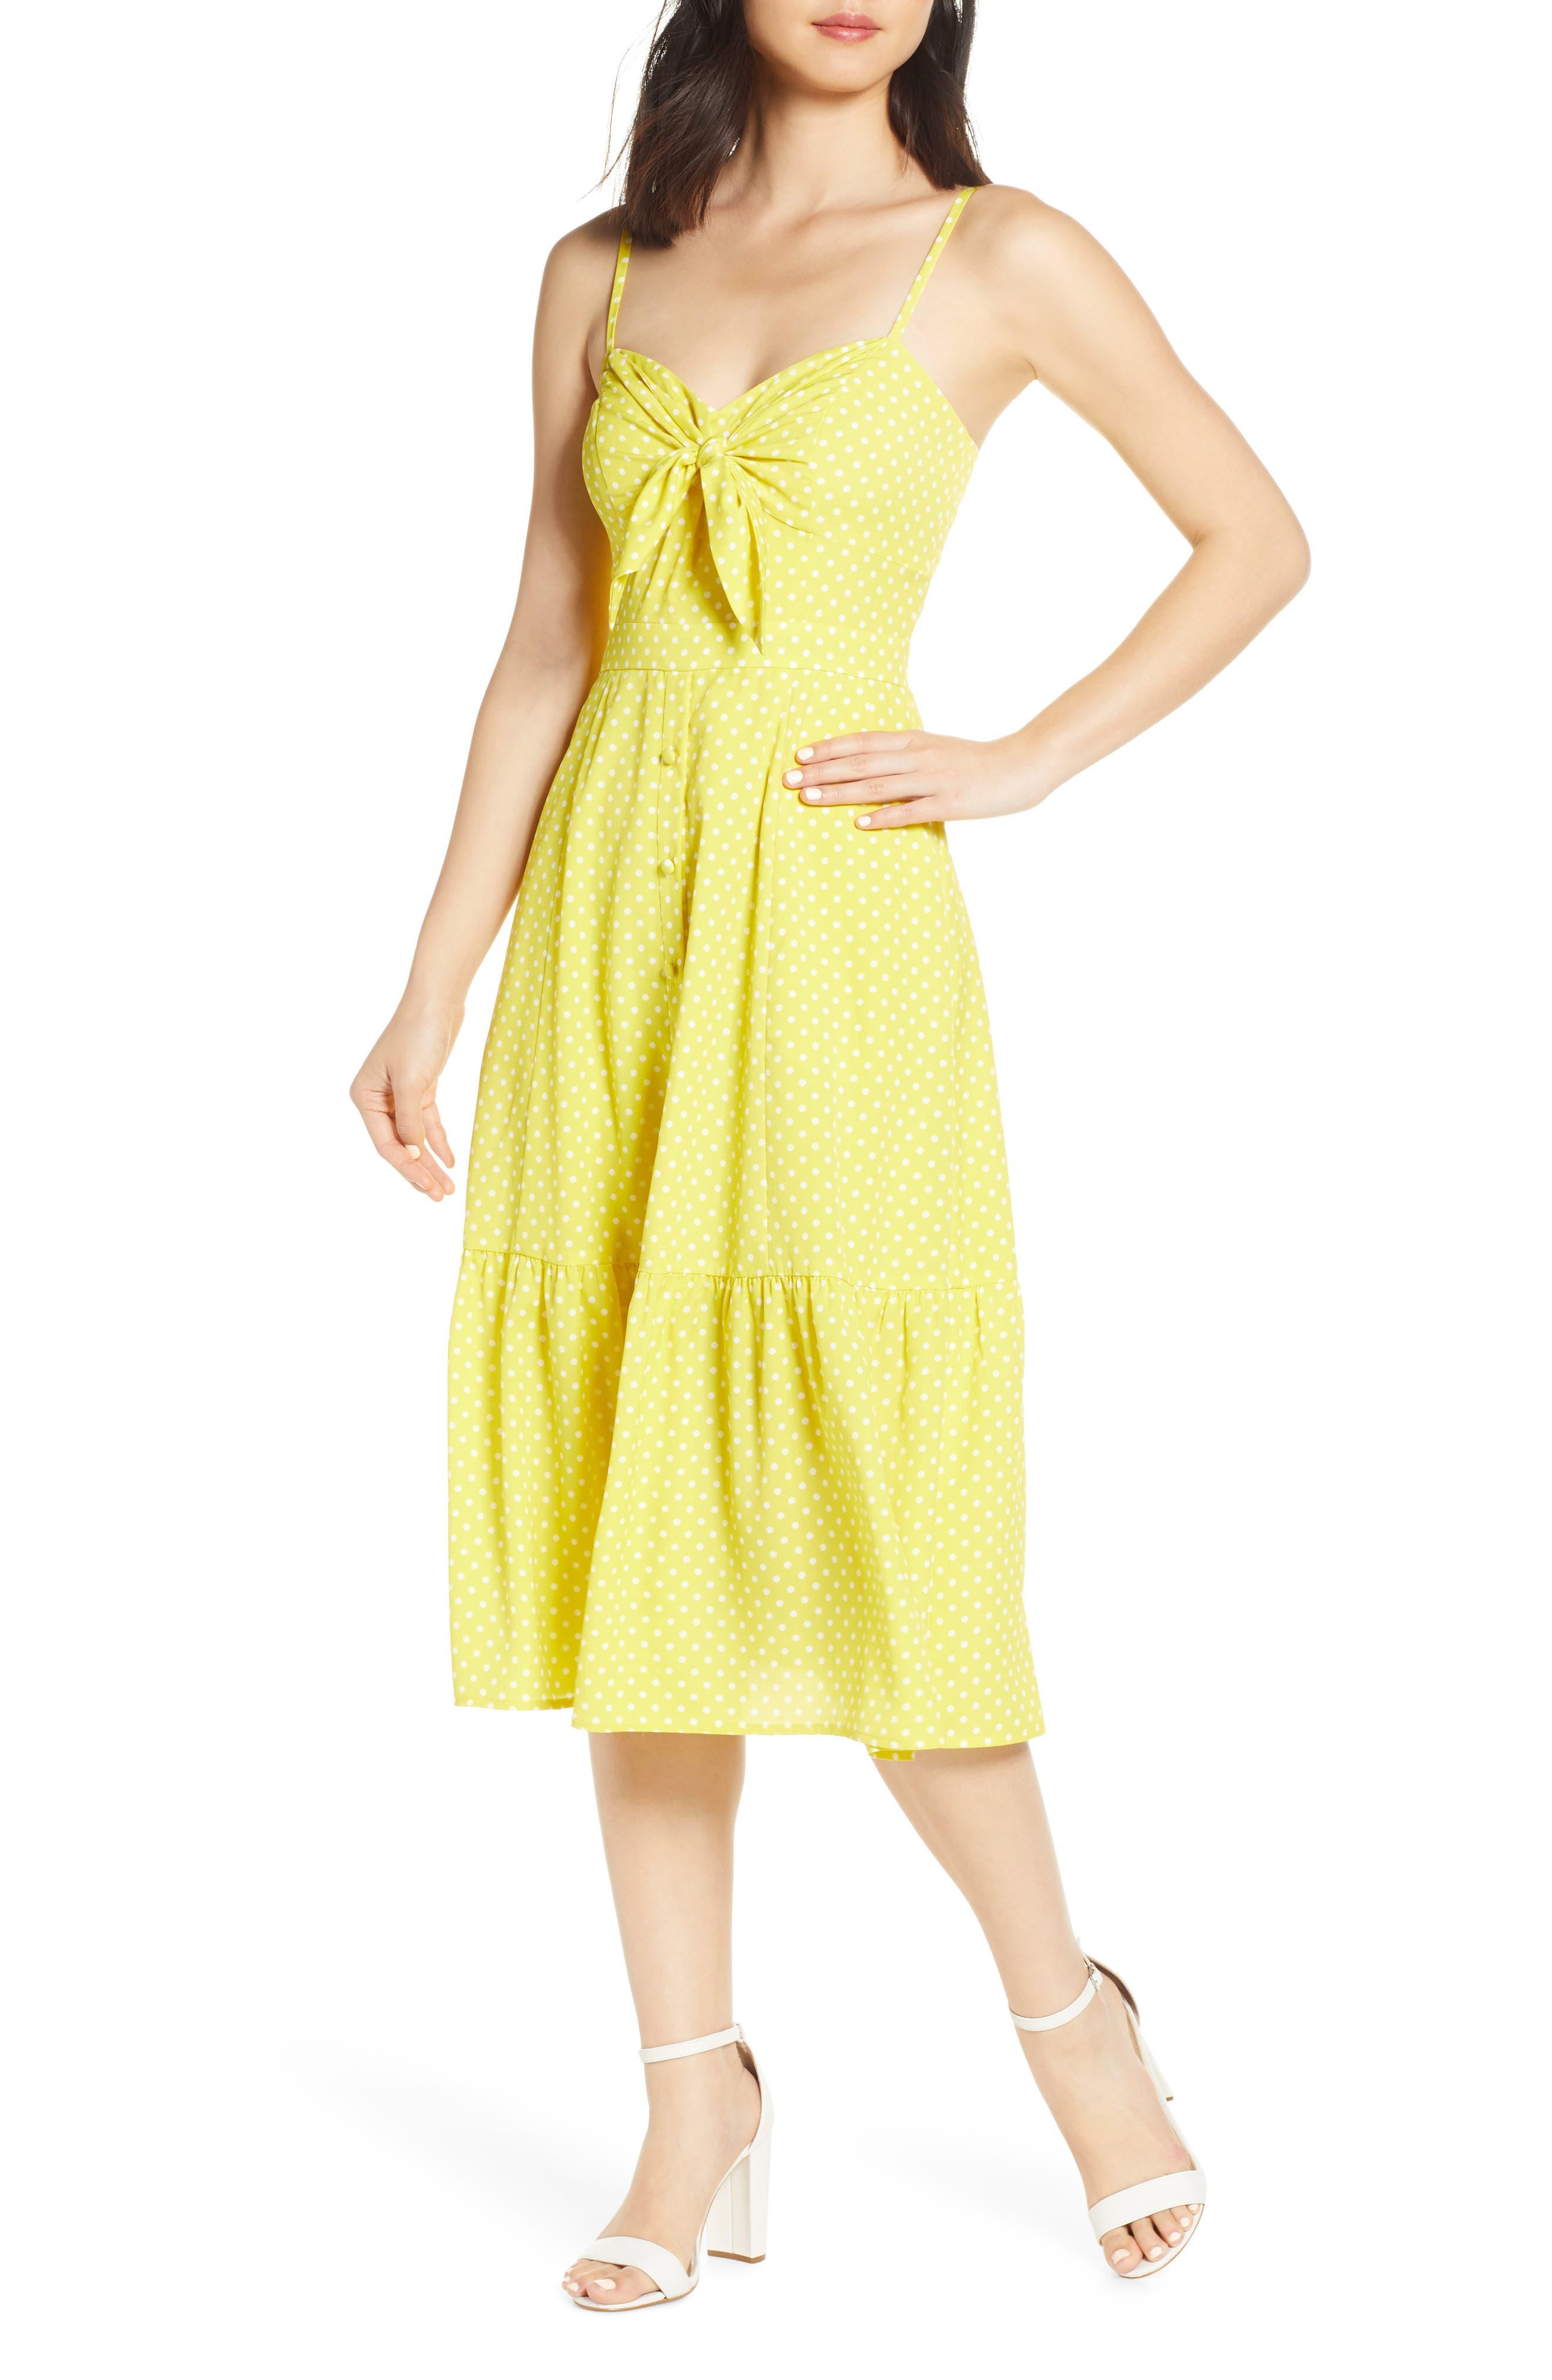 Eliza J Polka Dot Tie Front Sundress, Yellow